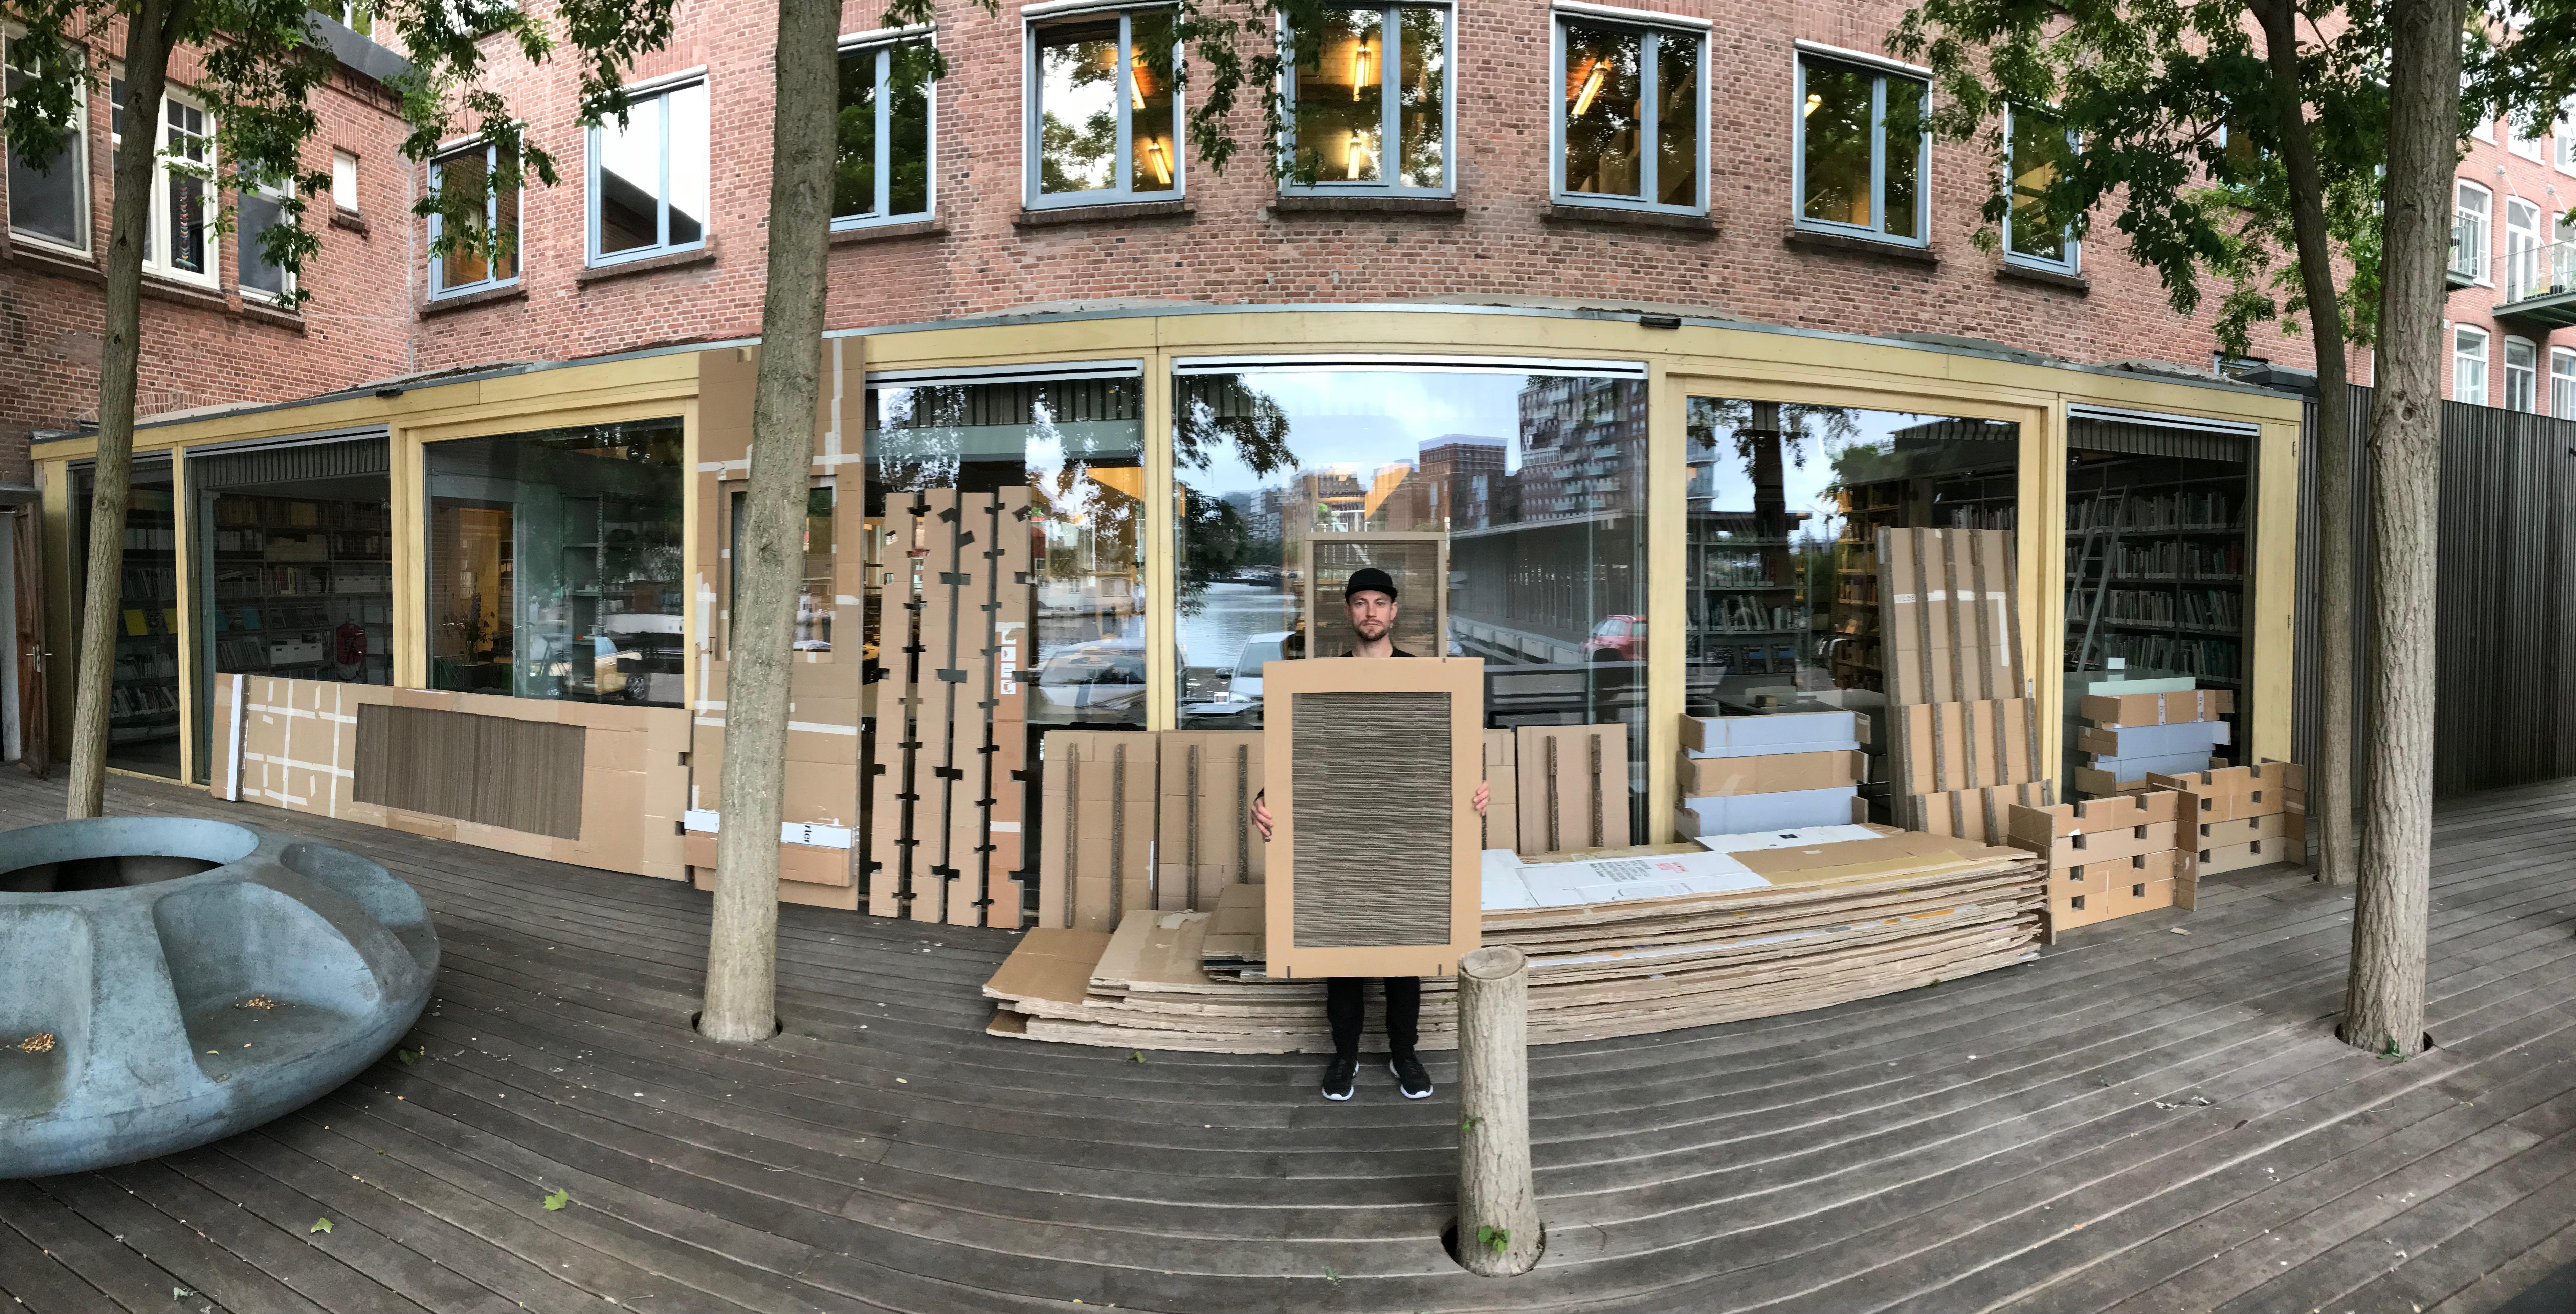 <p>Slaapkamer Thuislozen &#8211; Patrick Roegiers </p>